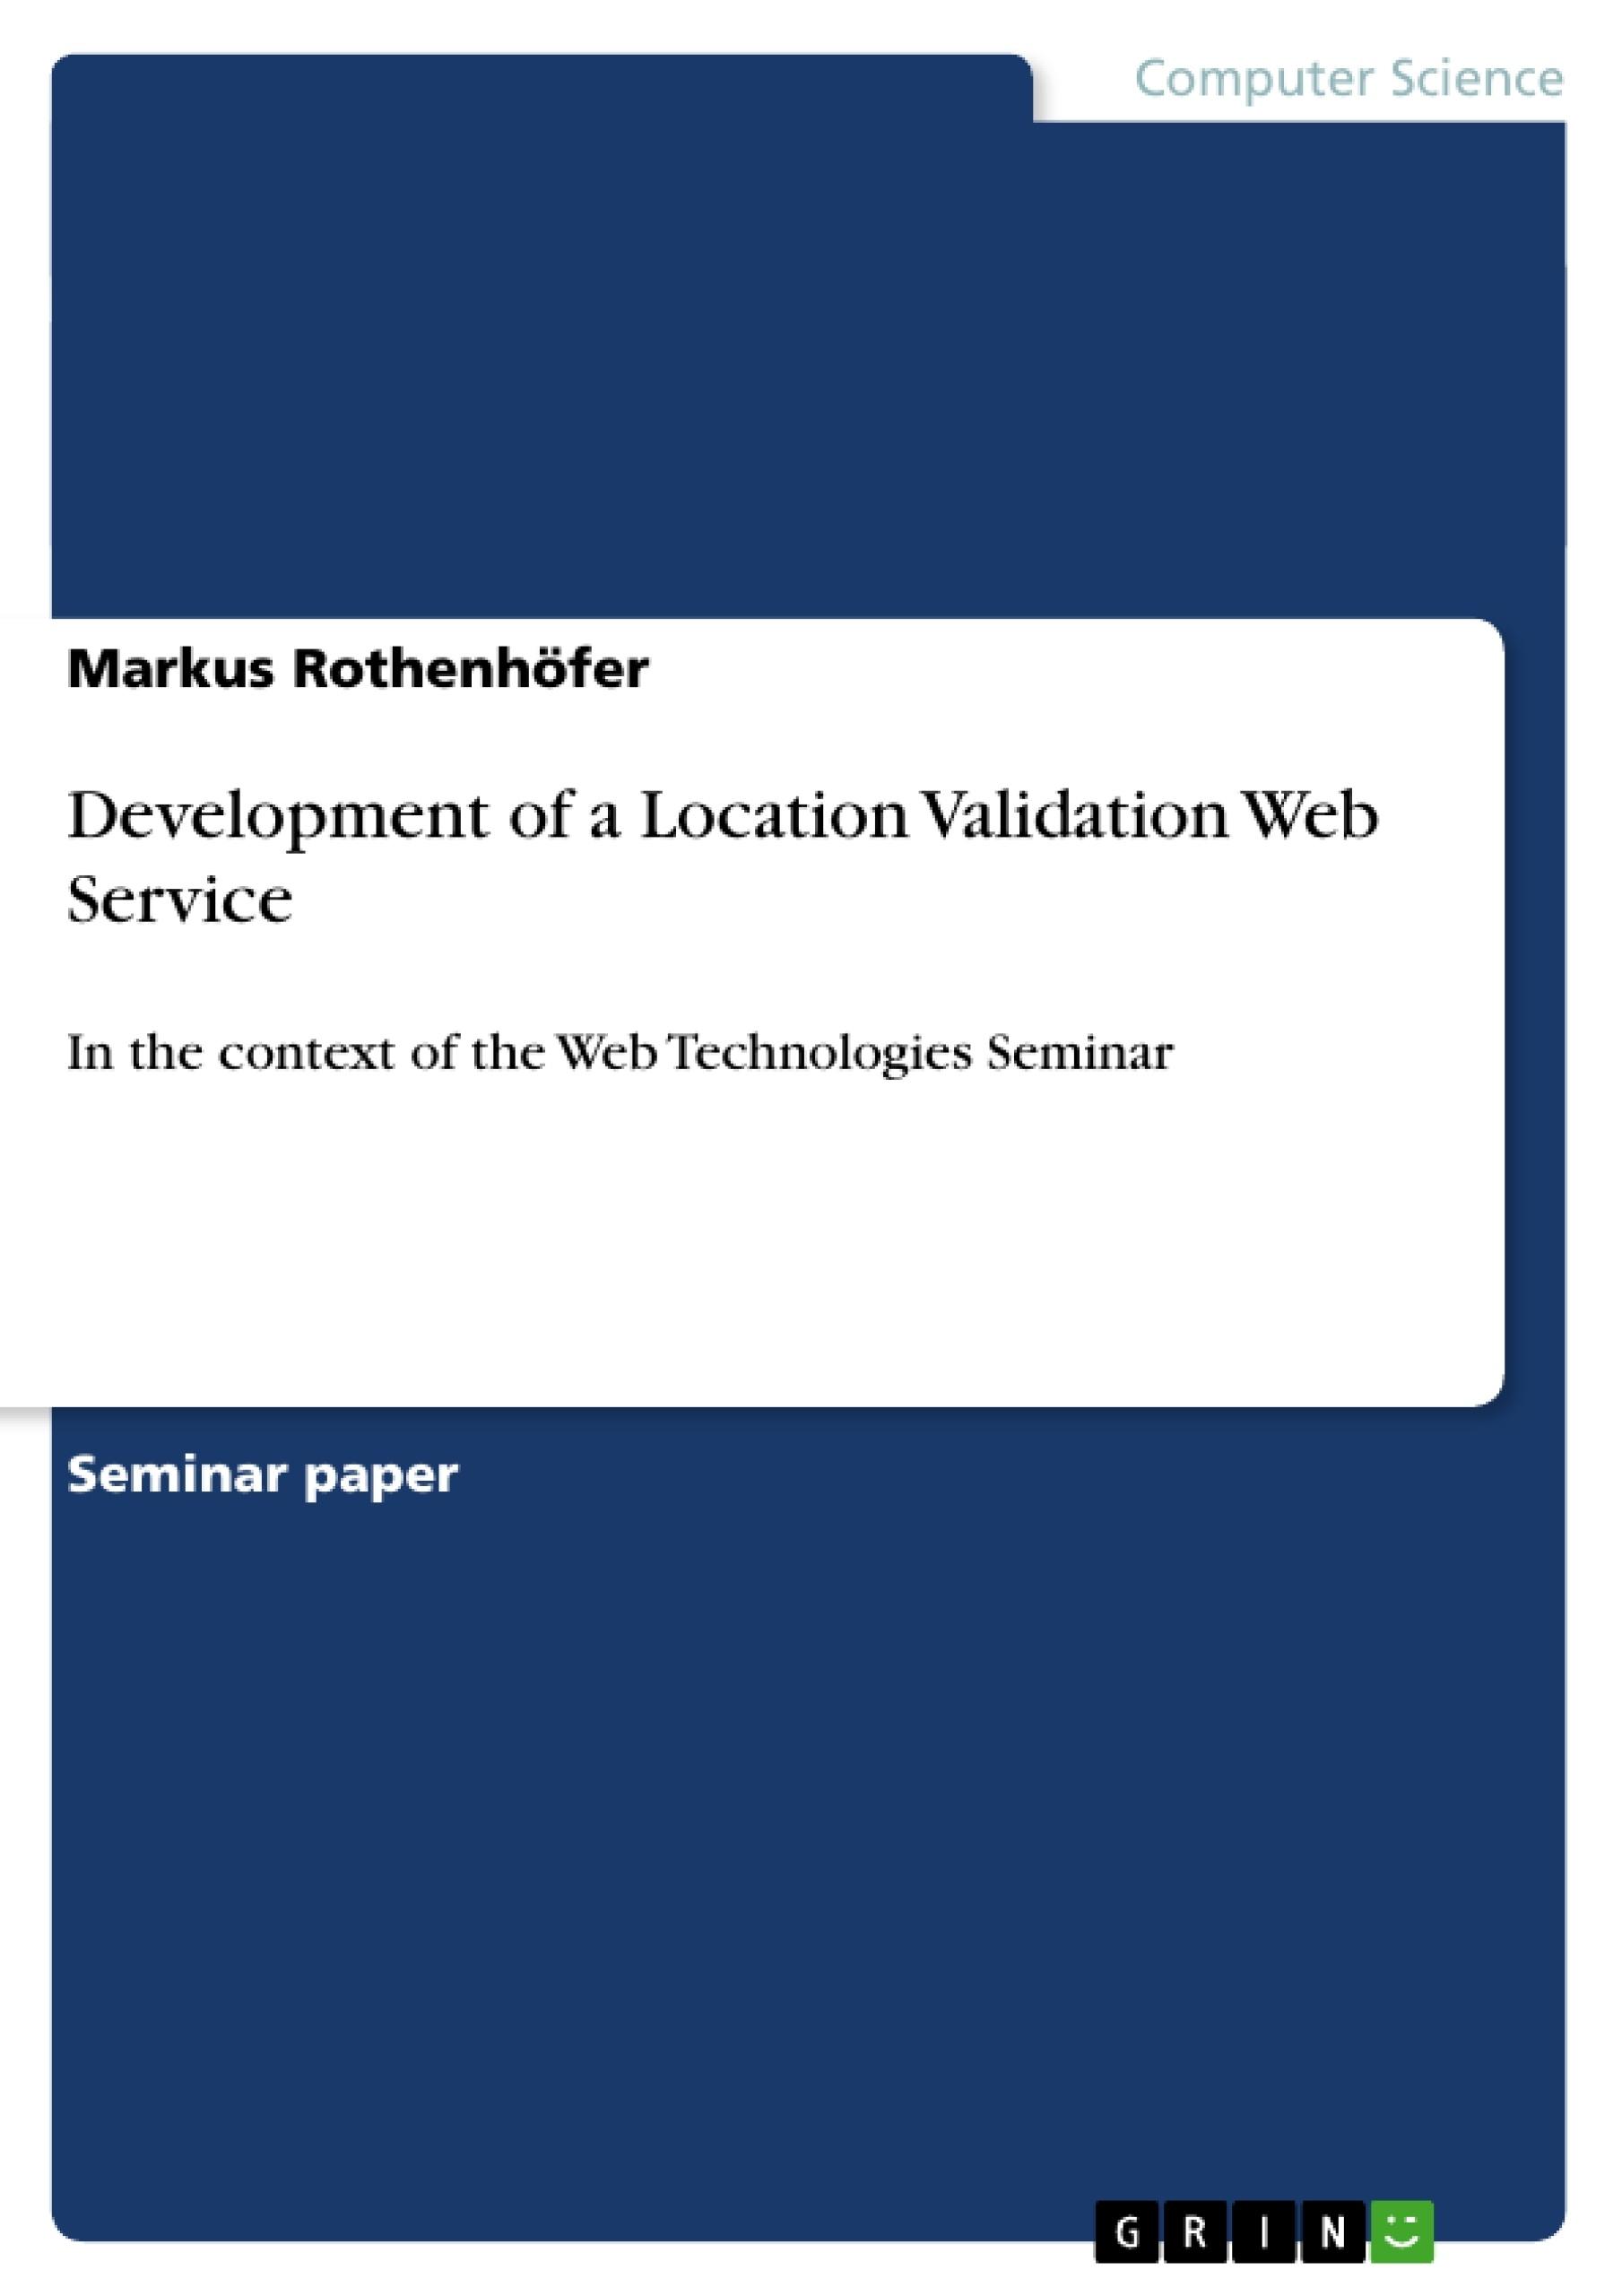 Title: Development of a Location Validation Web Service